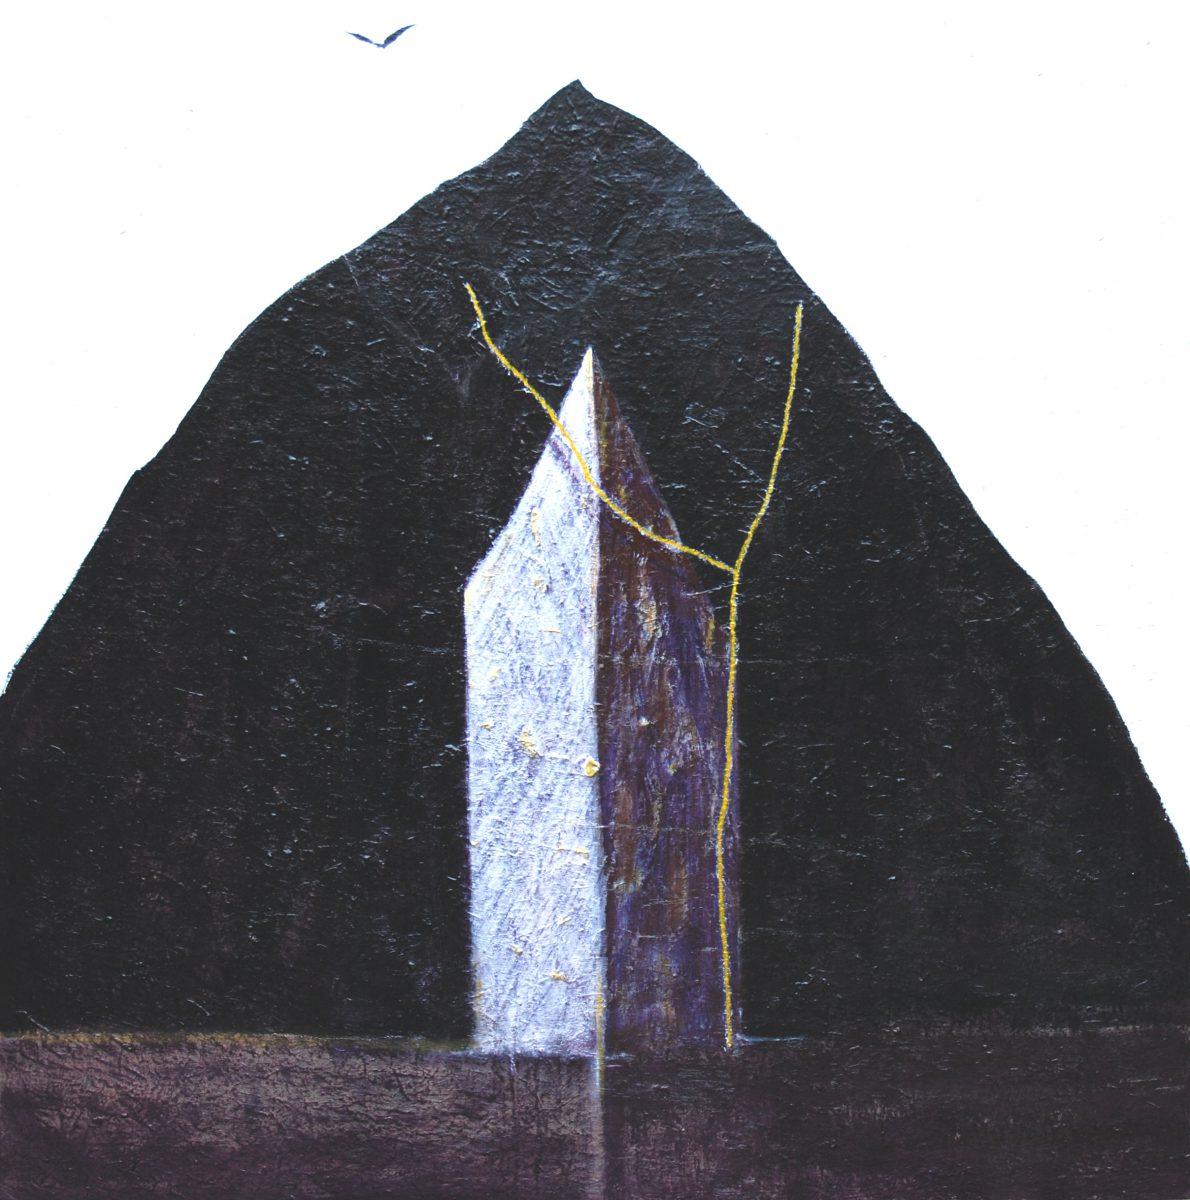 Pierantonio Verga, Una casa per poeti, 2011, tecnica mista su tela cm 130x120